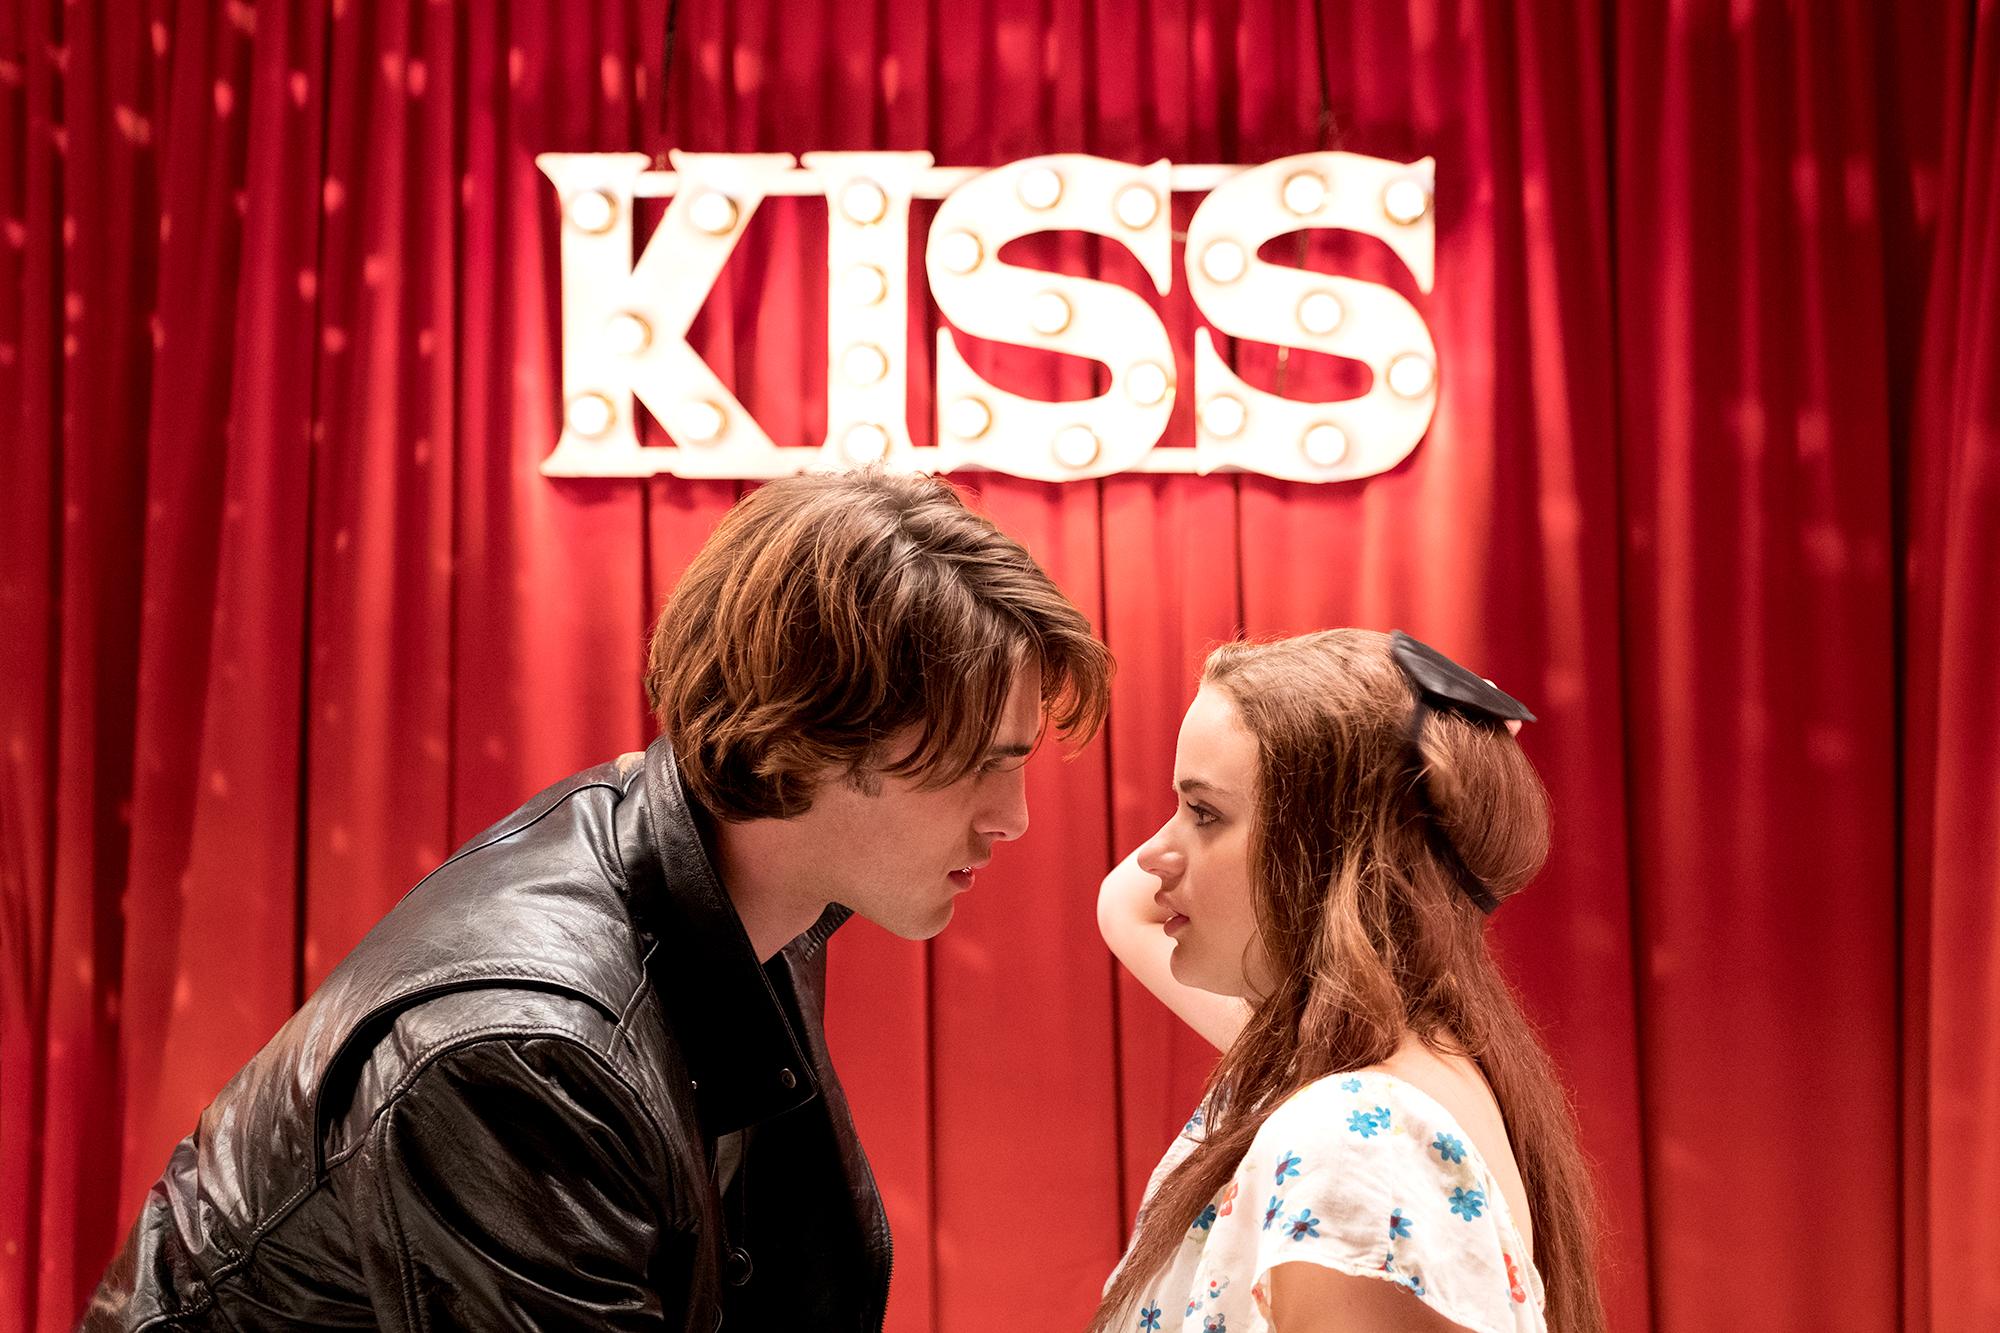 Joey-King-Jacob-Elordi-The-Kissing-Booth-2